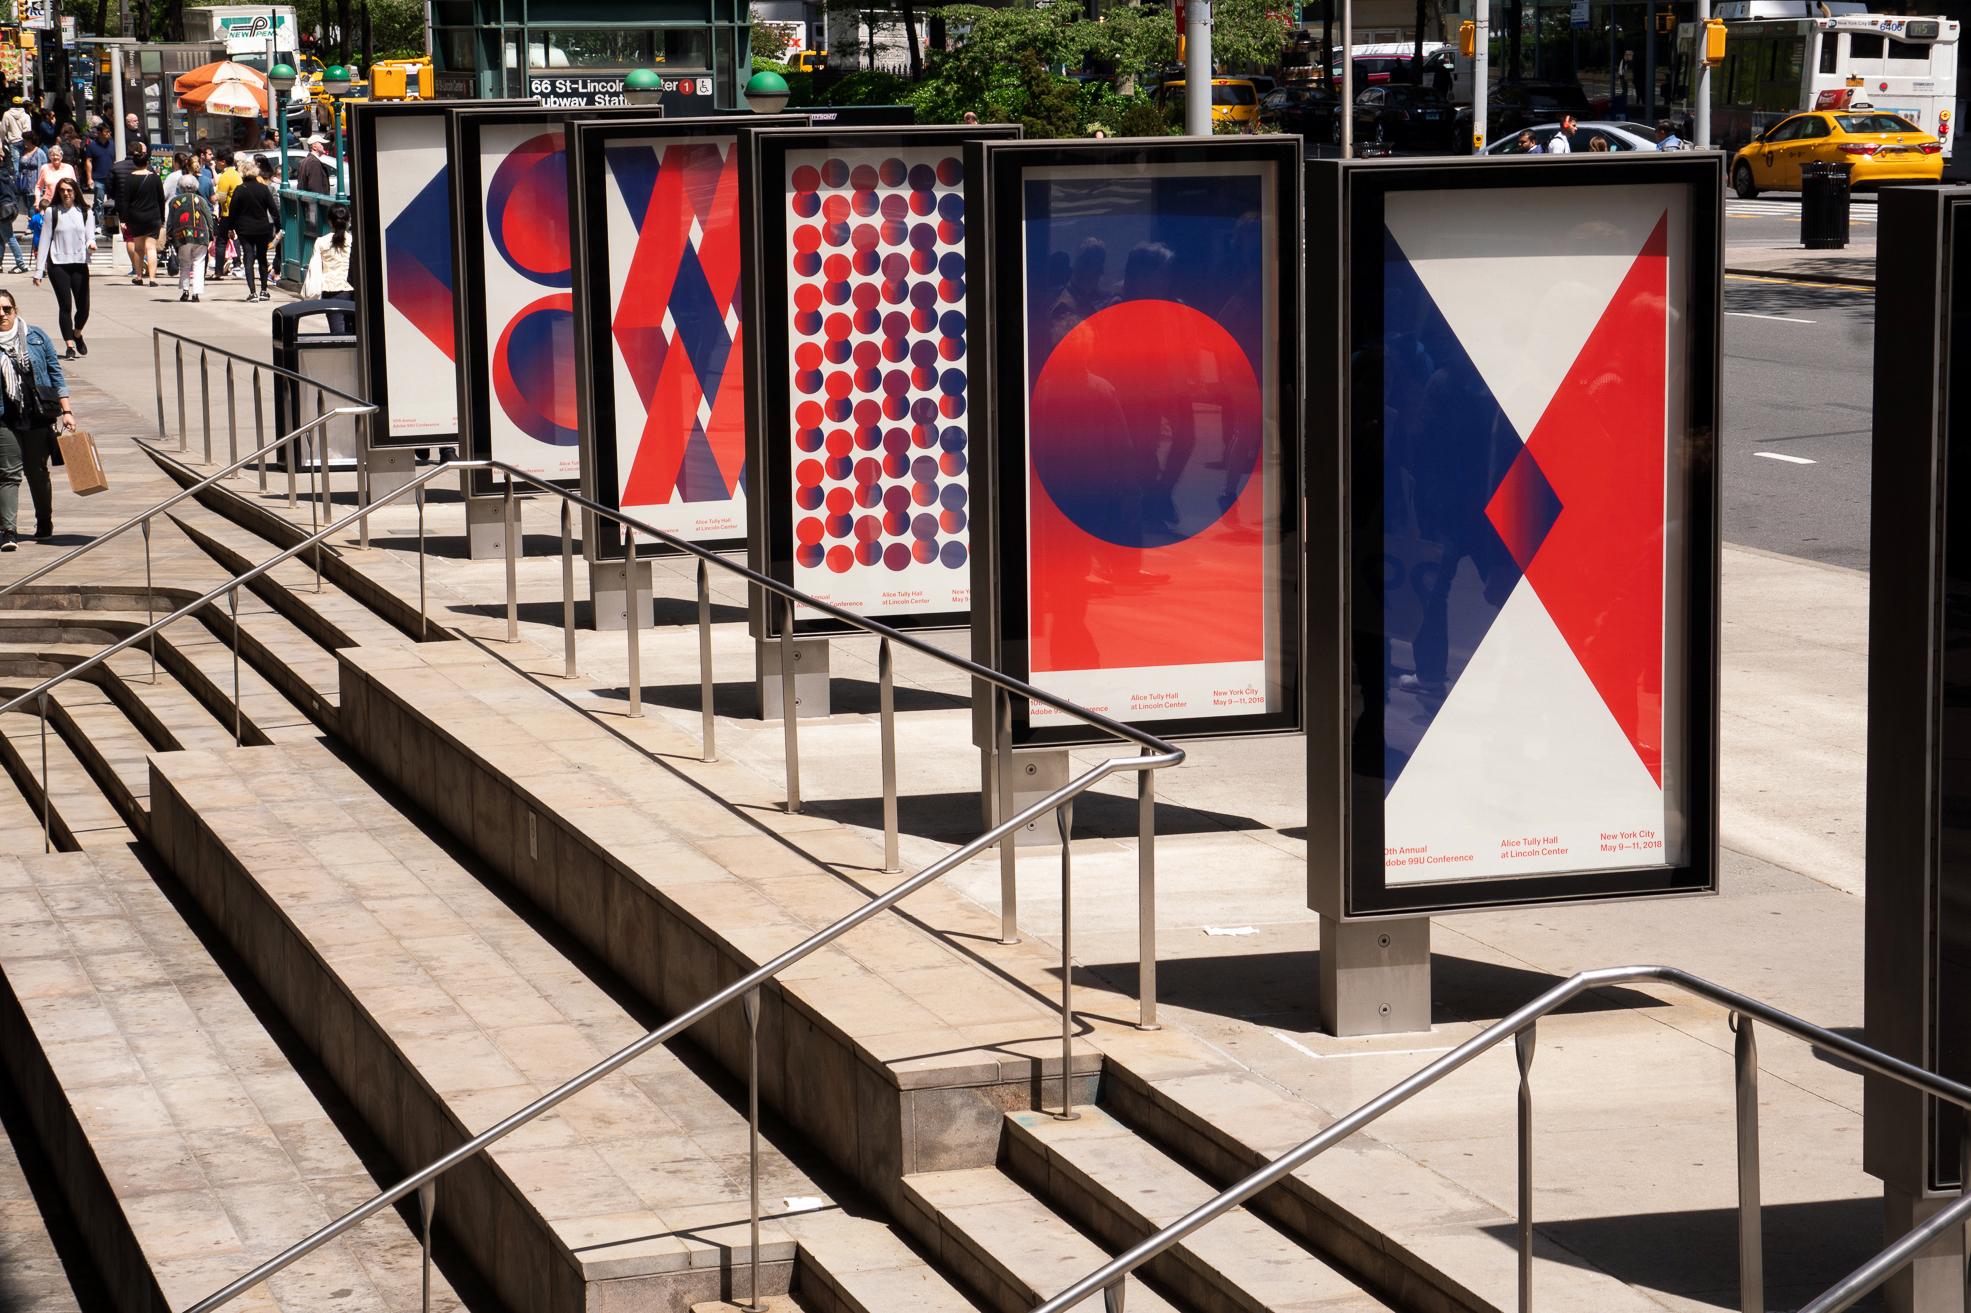 99U design work posters